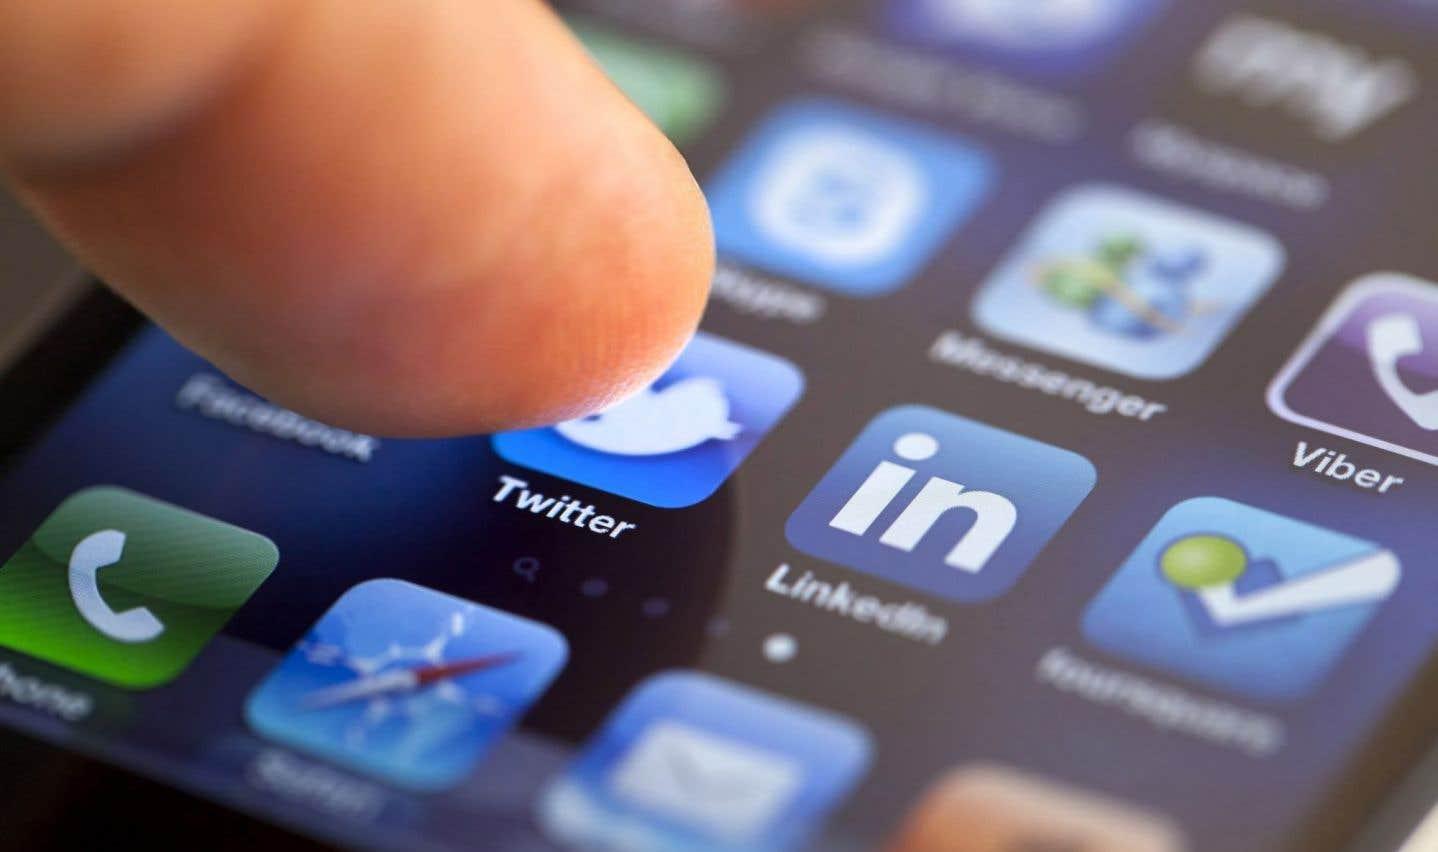 Twitter va lutter davantage contre les «trolls»